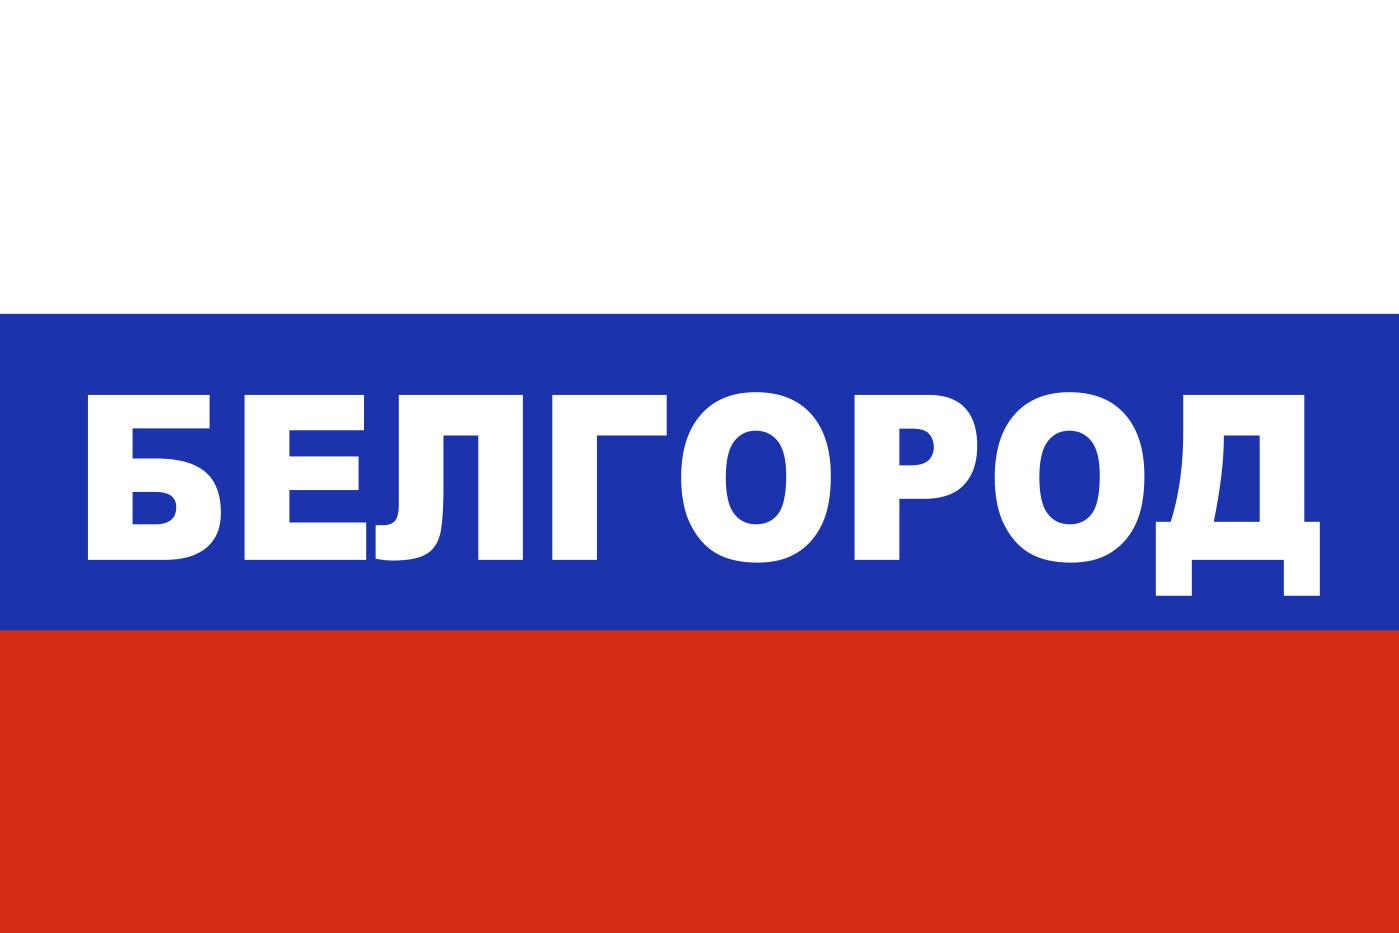 Флаг триколор Белгород